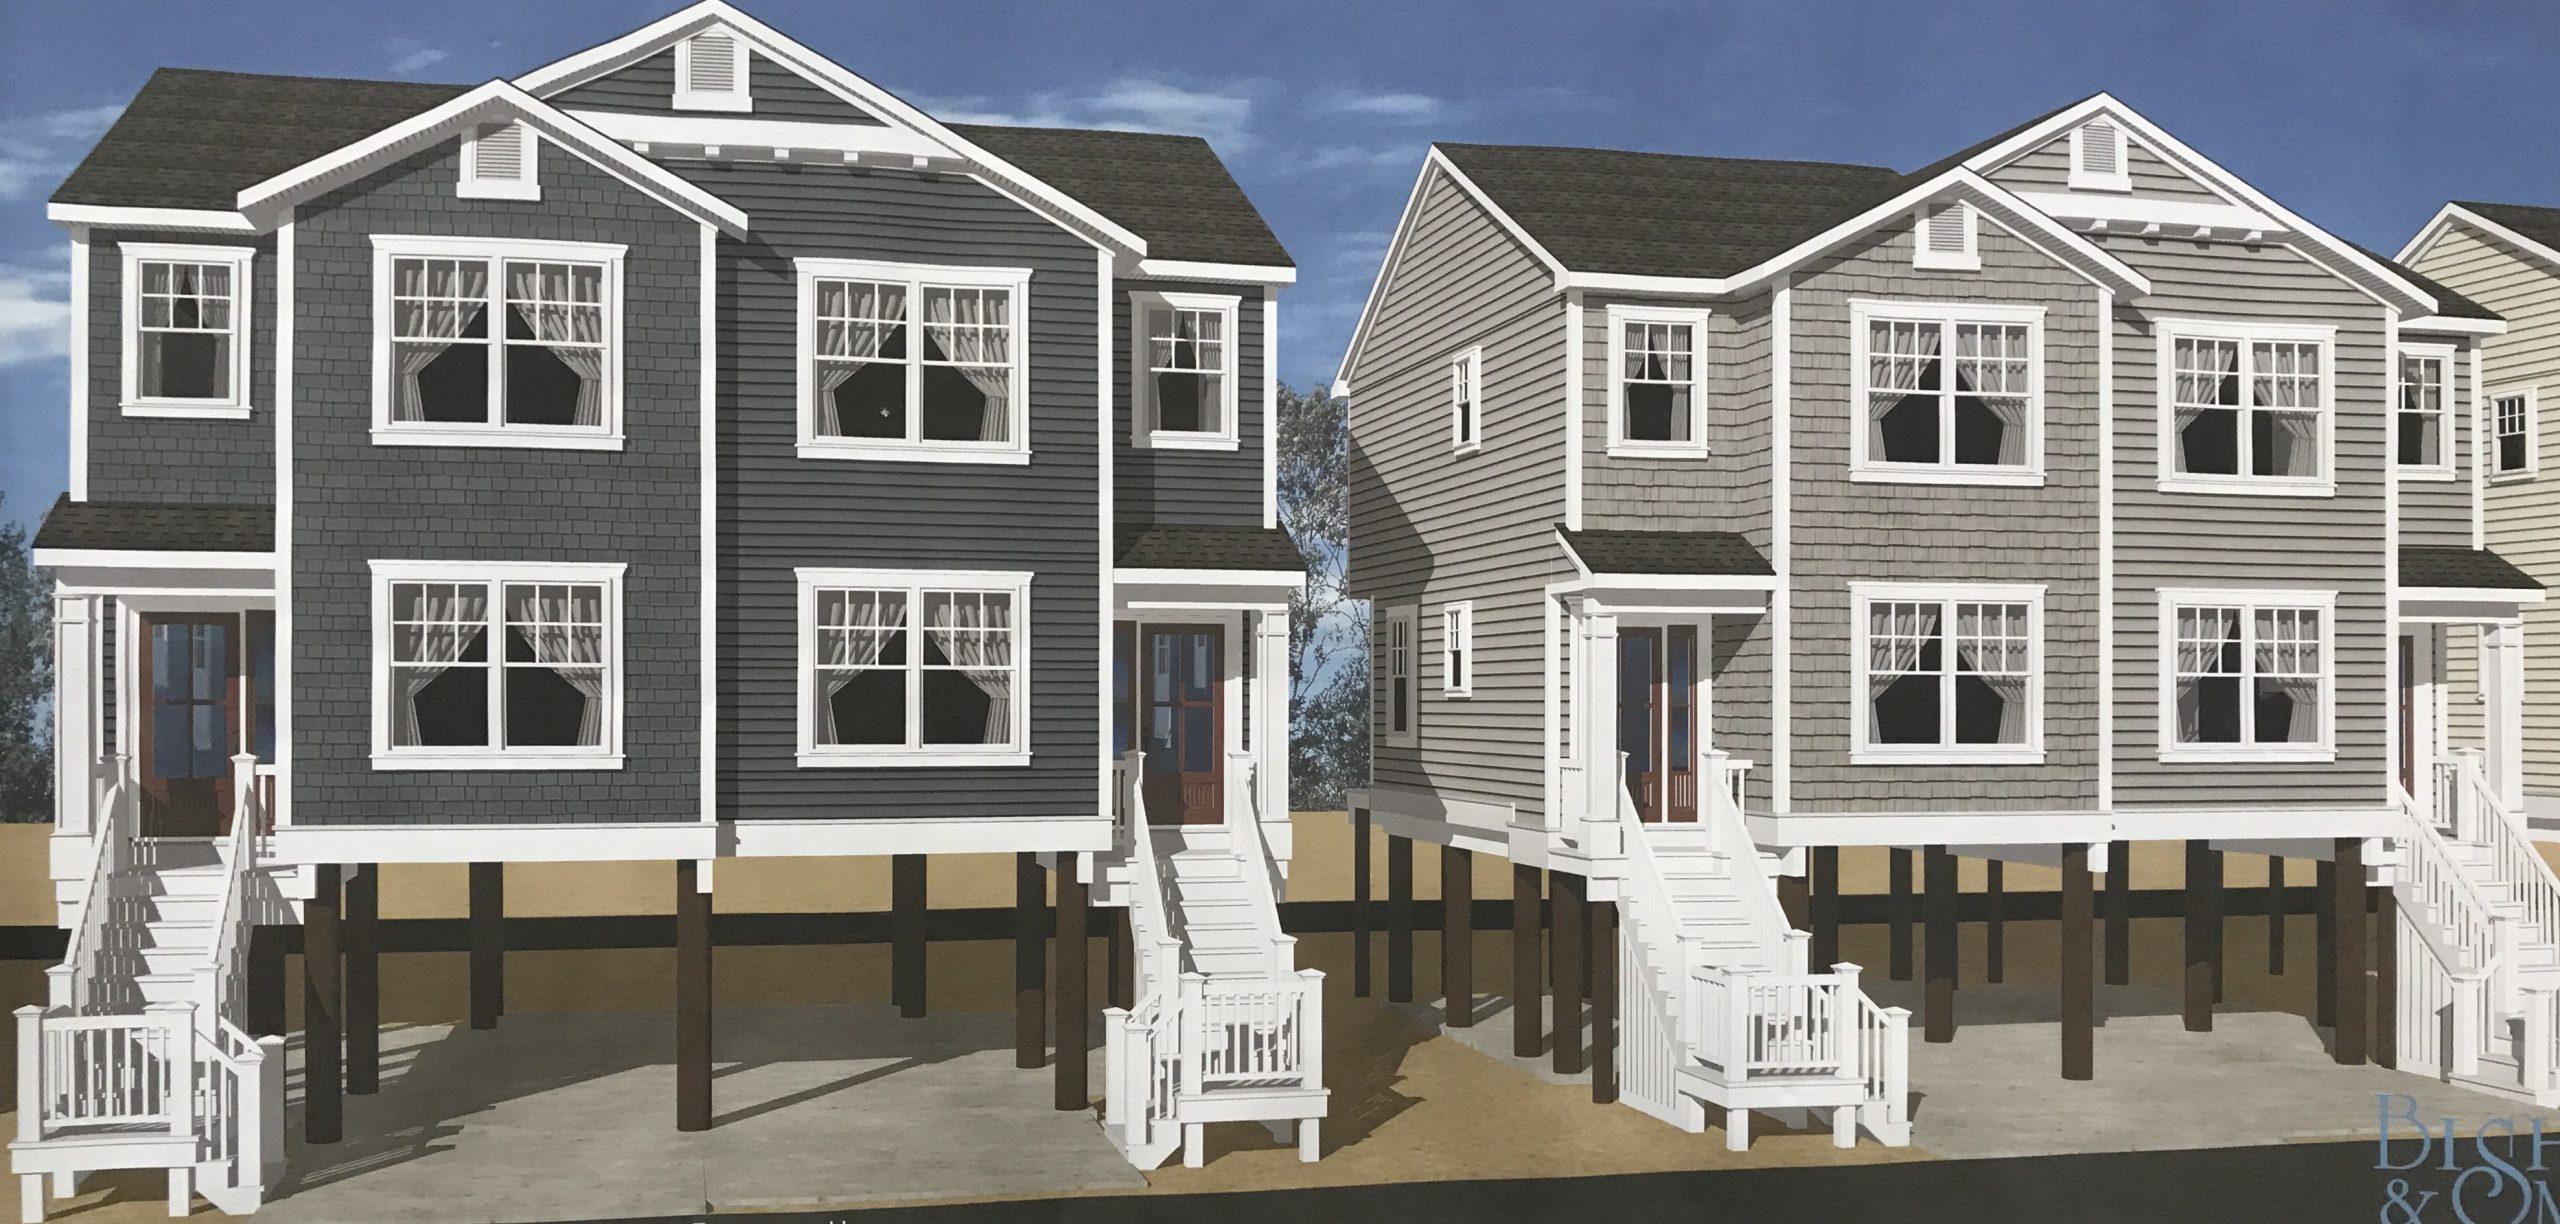 Duplex buildings proposed for Camp Osborn, Feb. 2020. (Photo: Daniel Nee)